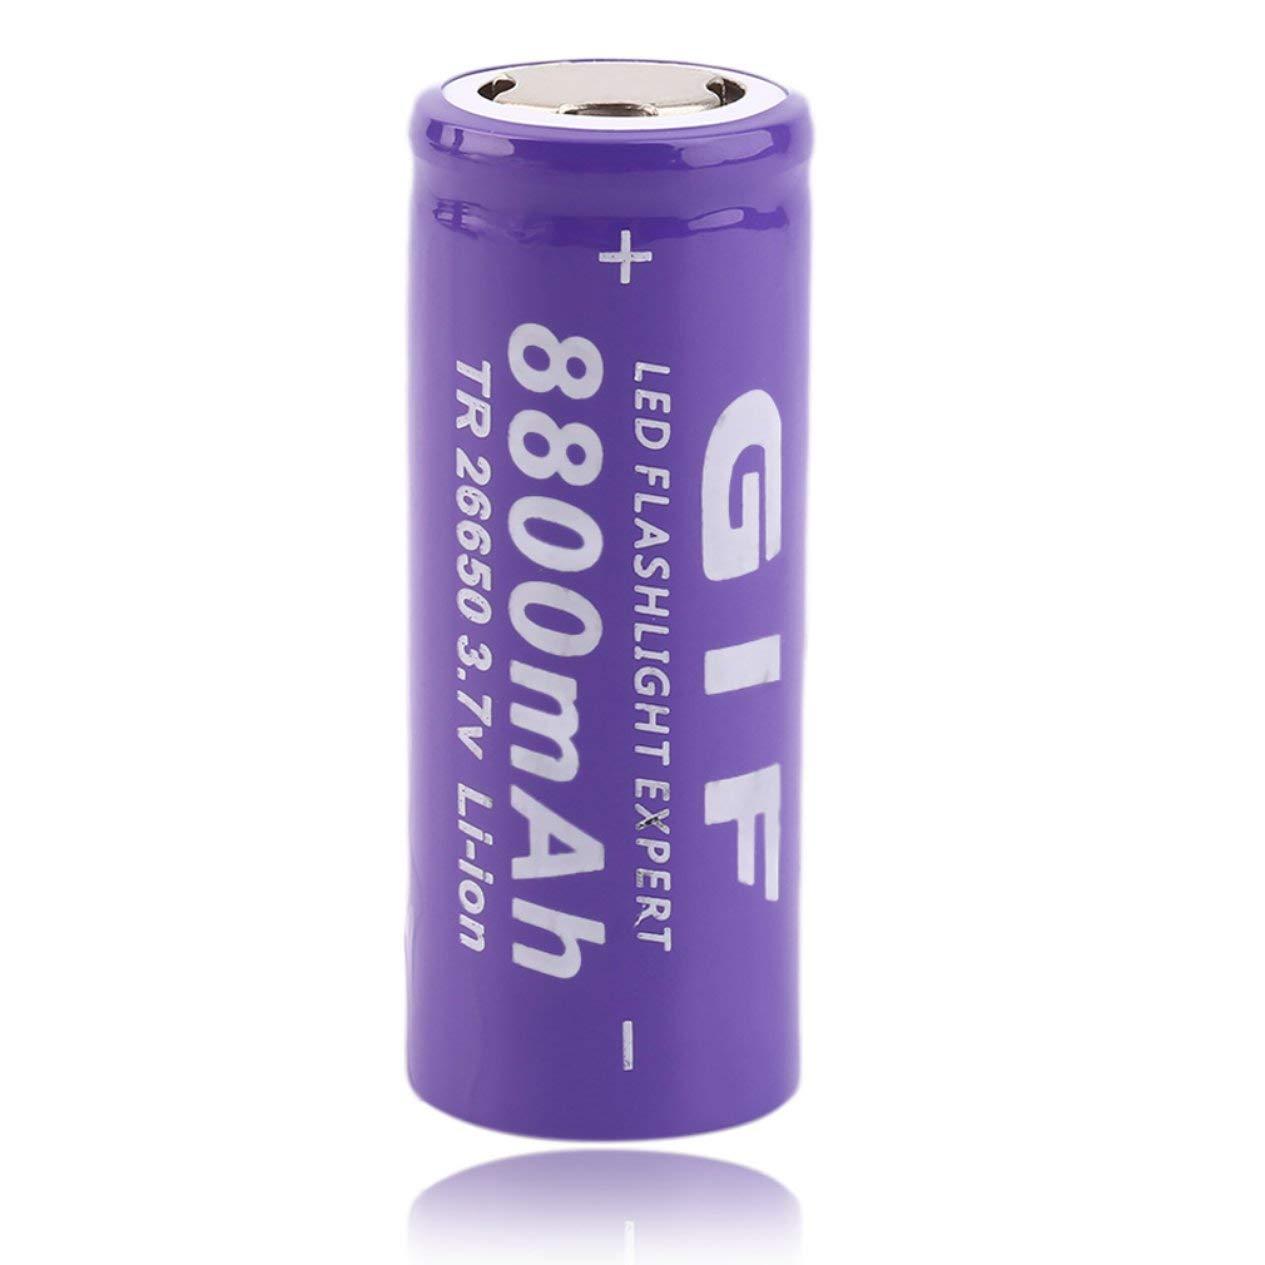 Li-Ionen-Akku, 26650 3,7V 8800mAh umweltfreundlicher Akku, für LED-Taschenlampe für LED-Taschenlampe Ironheel